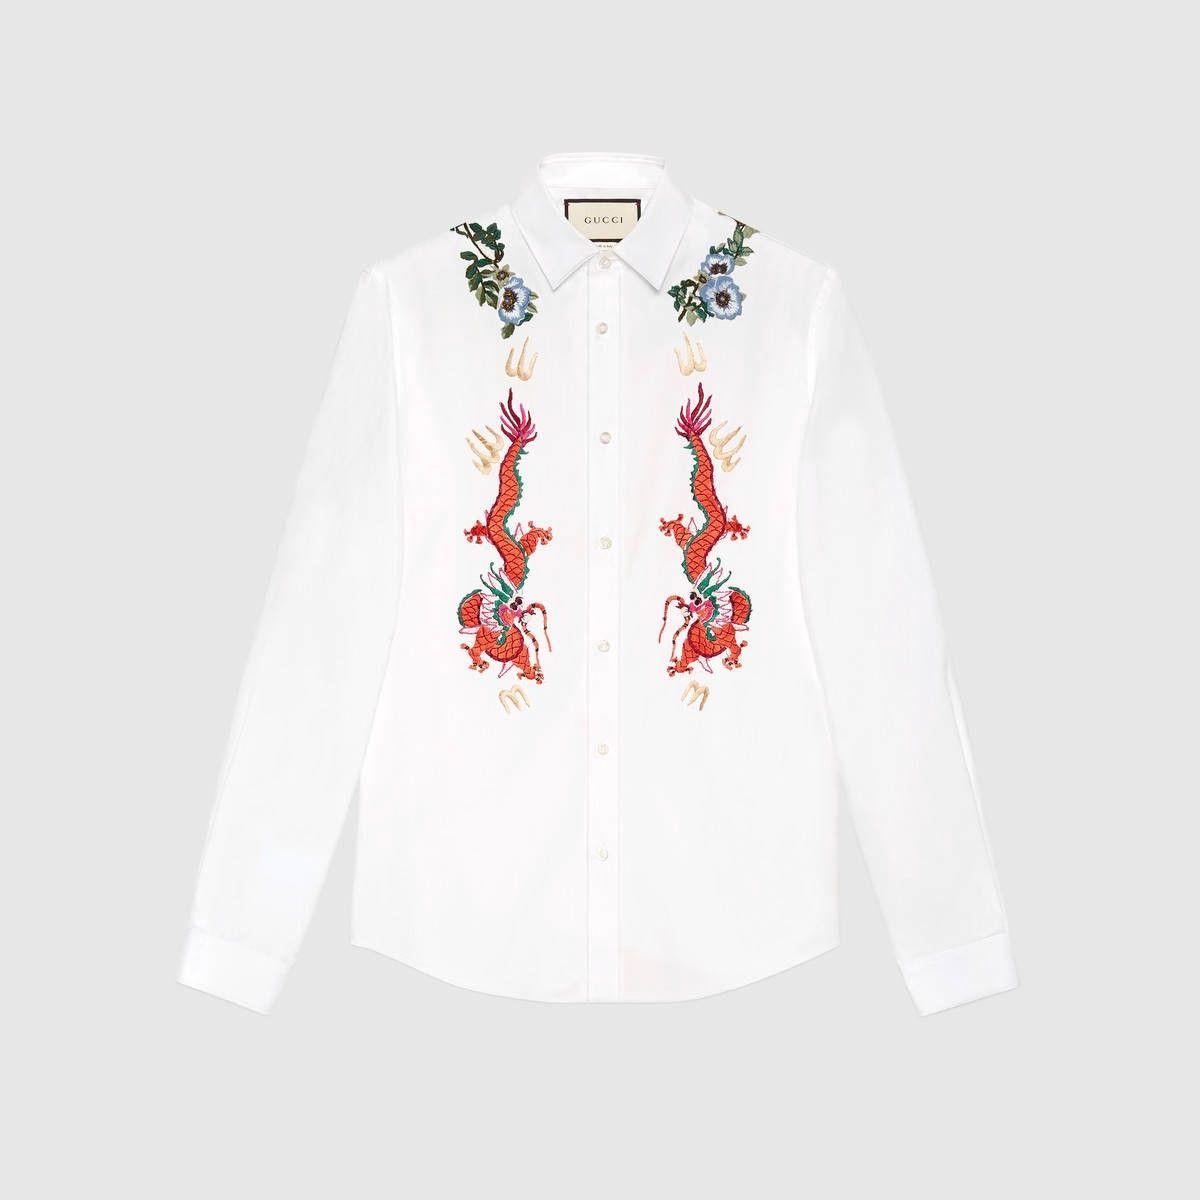 cc7fafab1 GUCCI Cotton Duke Shirt With Embroidery - White Cotton. #gucci #cloth #all